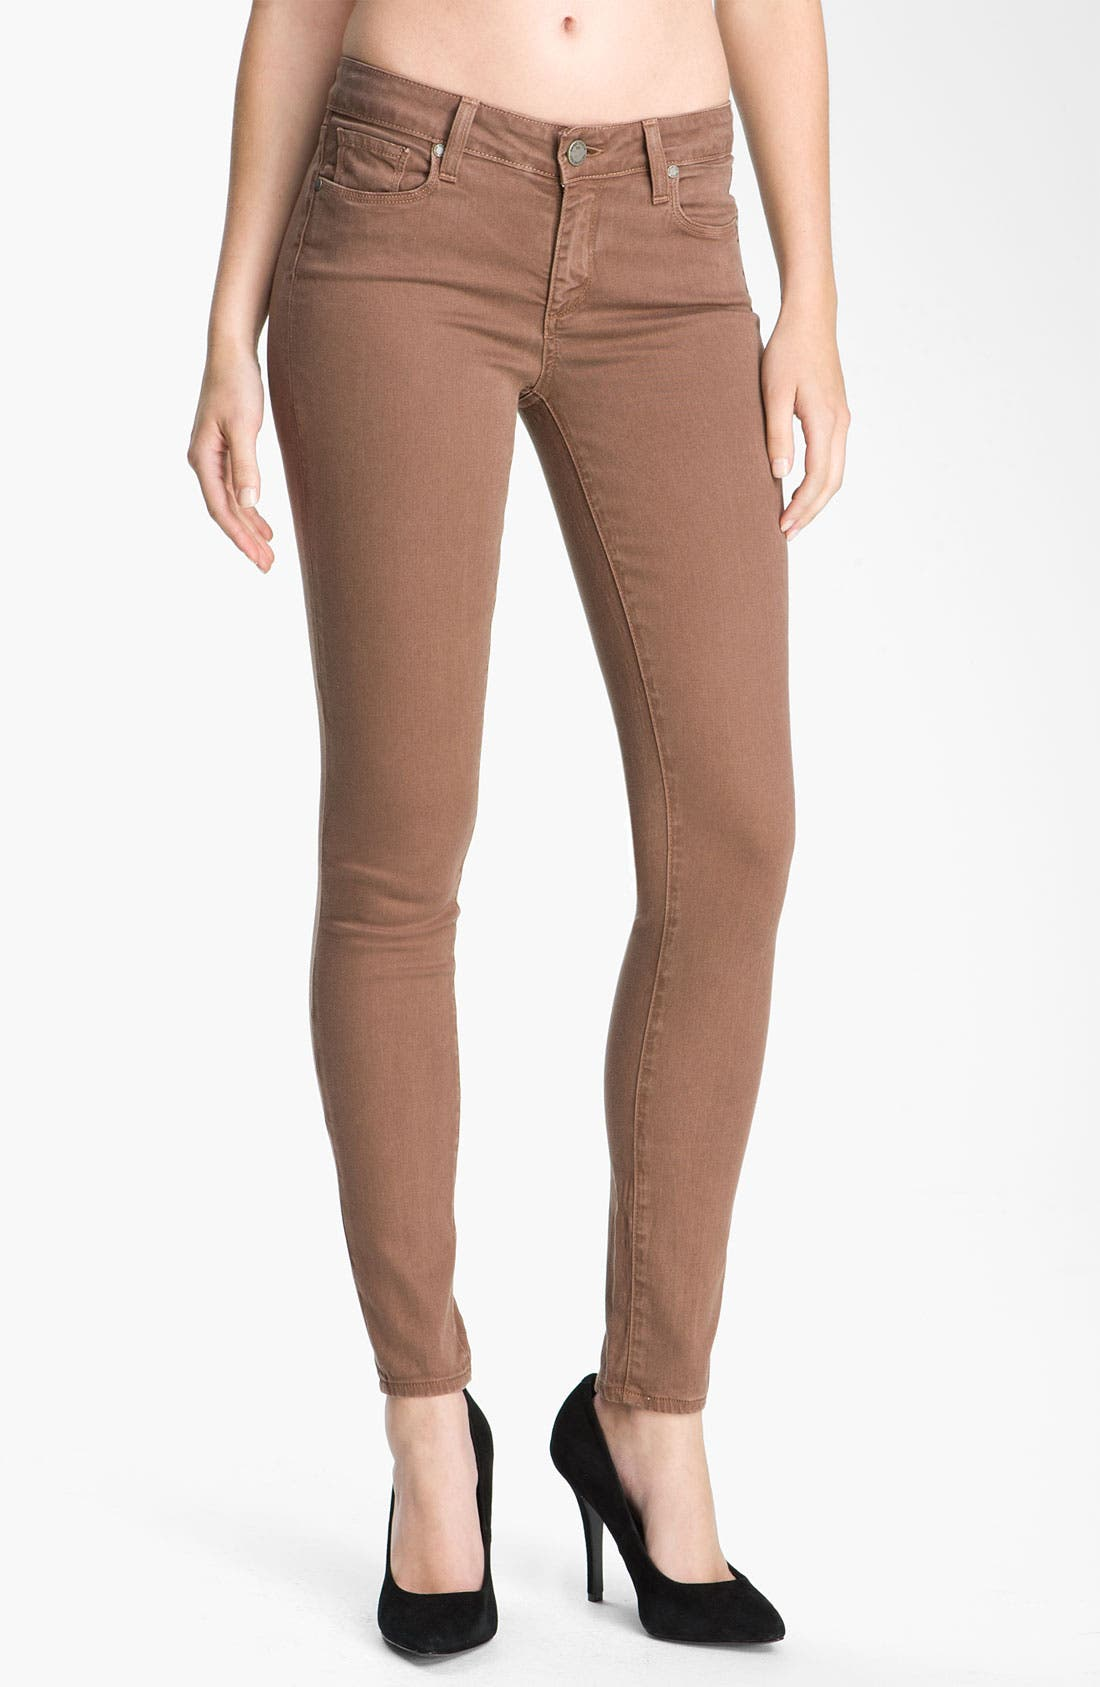 Main Image - Paige Denim 'Verdugo' Skinny Stretch Jeans (Rothko)